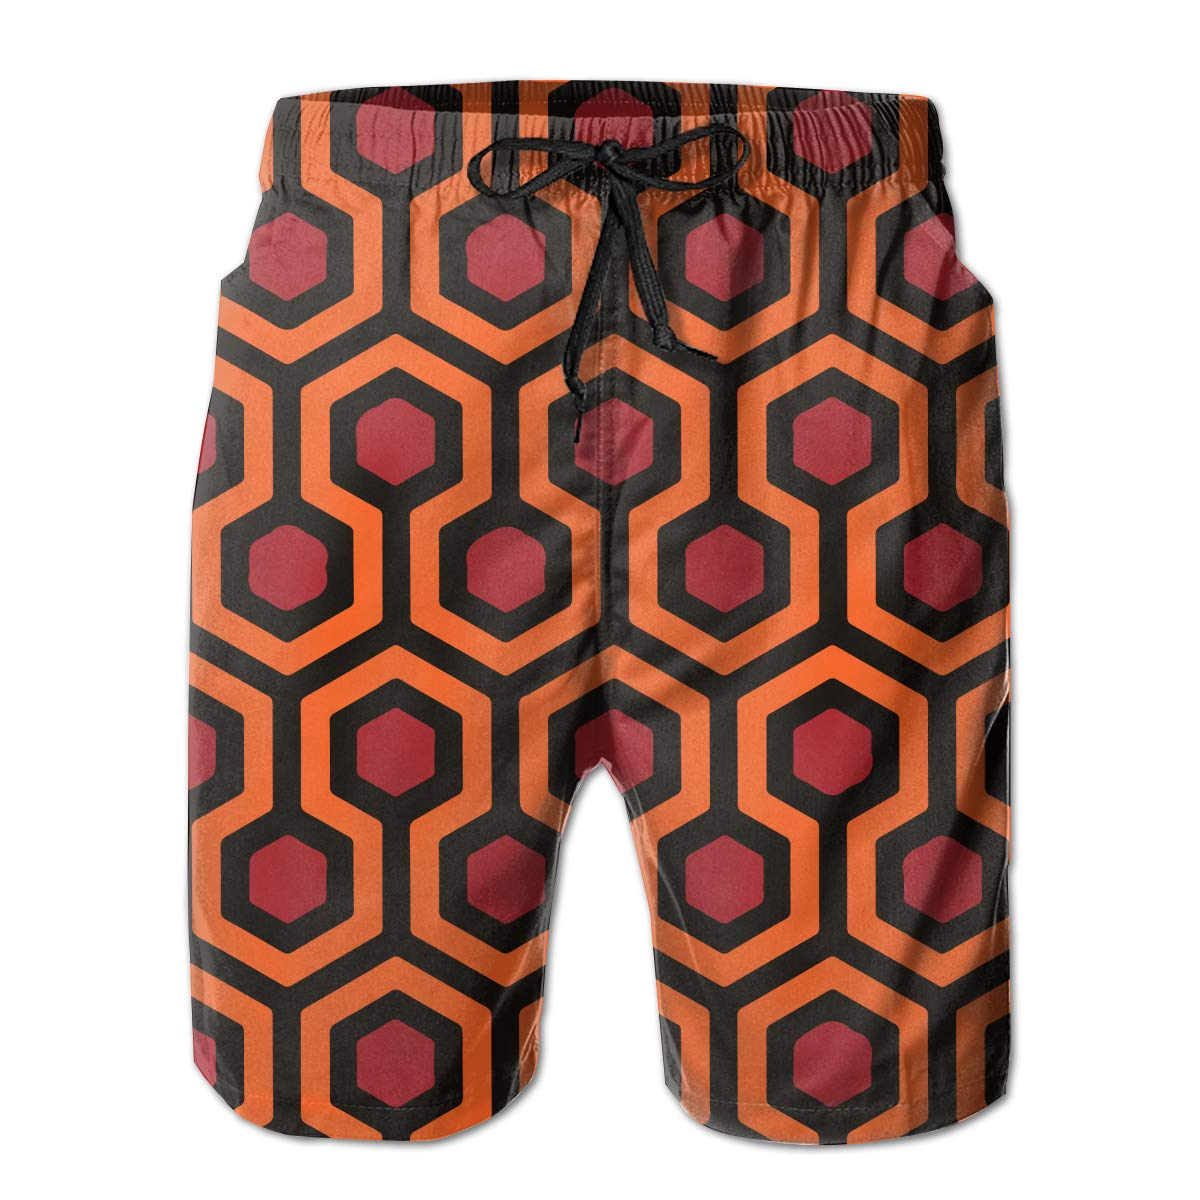 JIA LI Mens Board Shorts Shining Carpet Pattern Summer Printed Quick-Dry Swim Trunks Beach Shorts